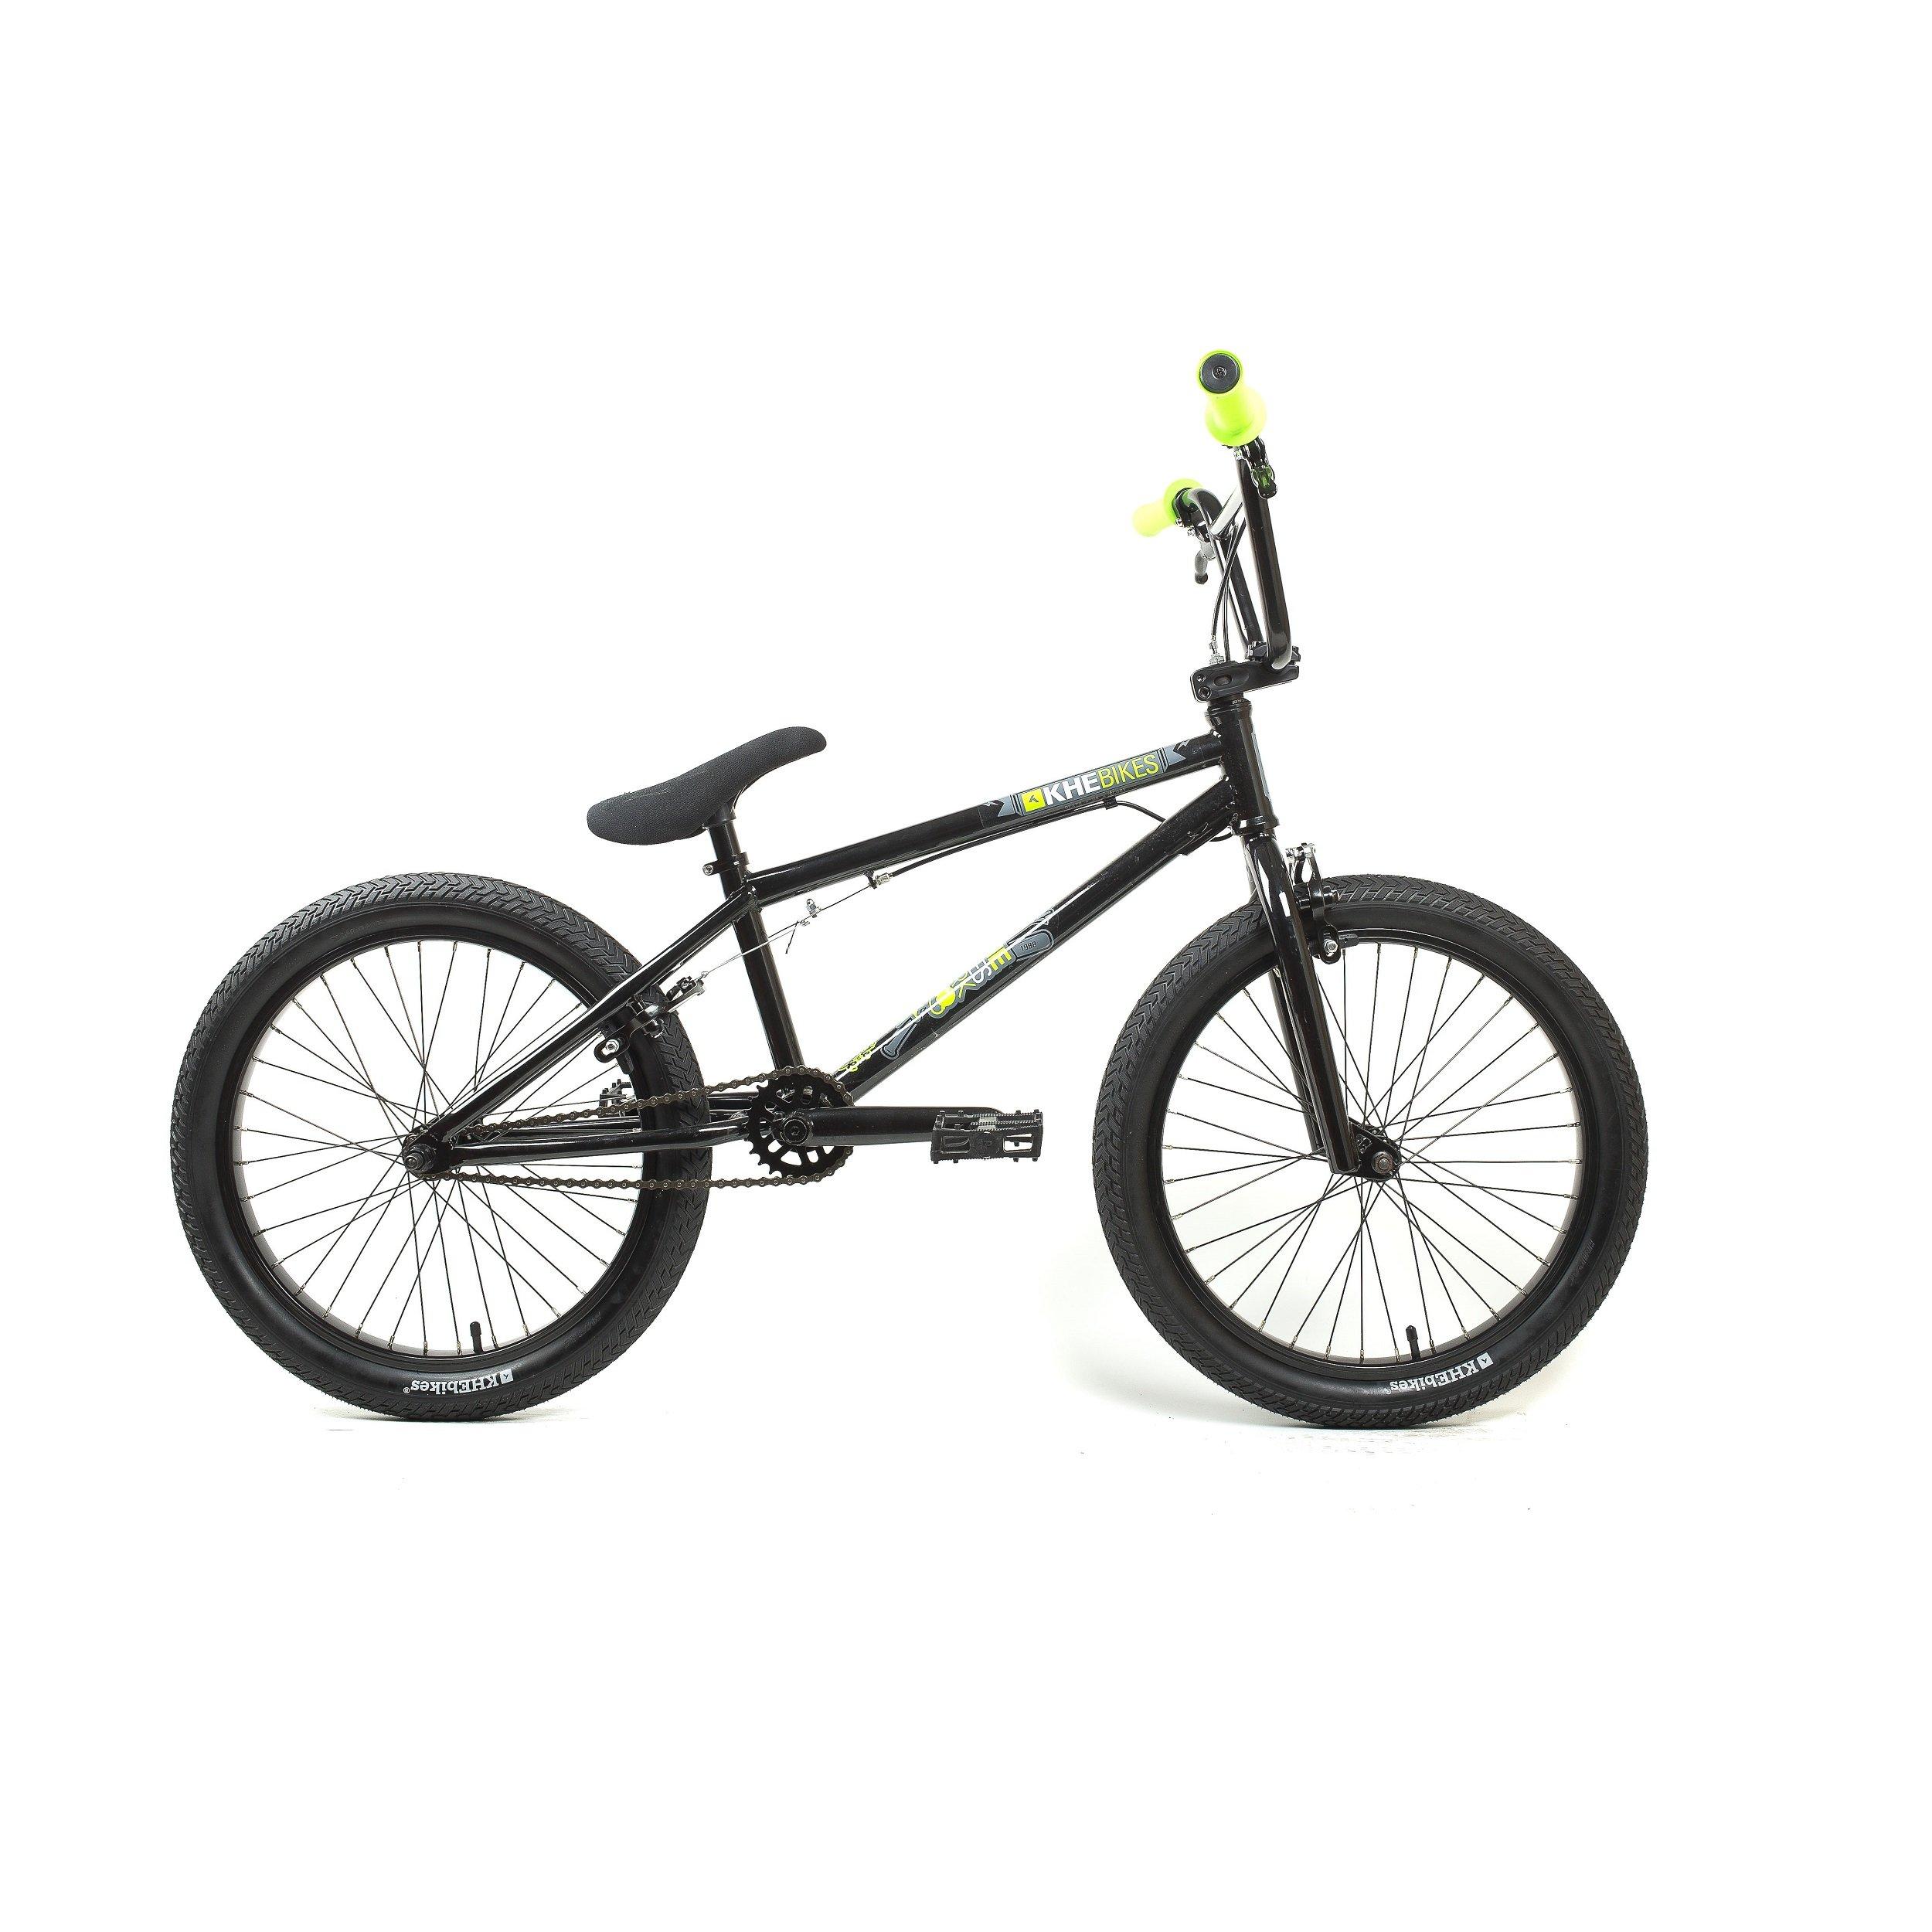 KHE Bikes Park Two Freestyle BMX Bicycles, Black by KHE Bikes